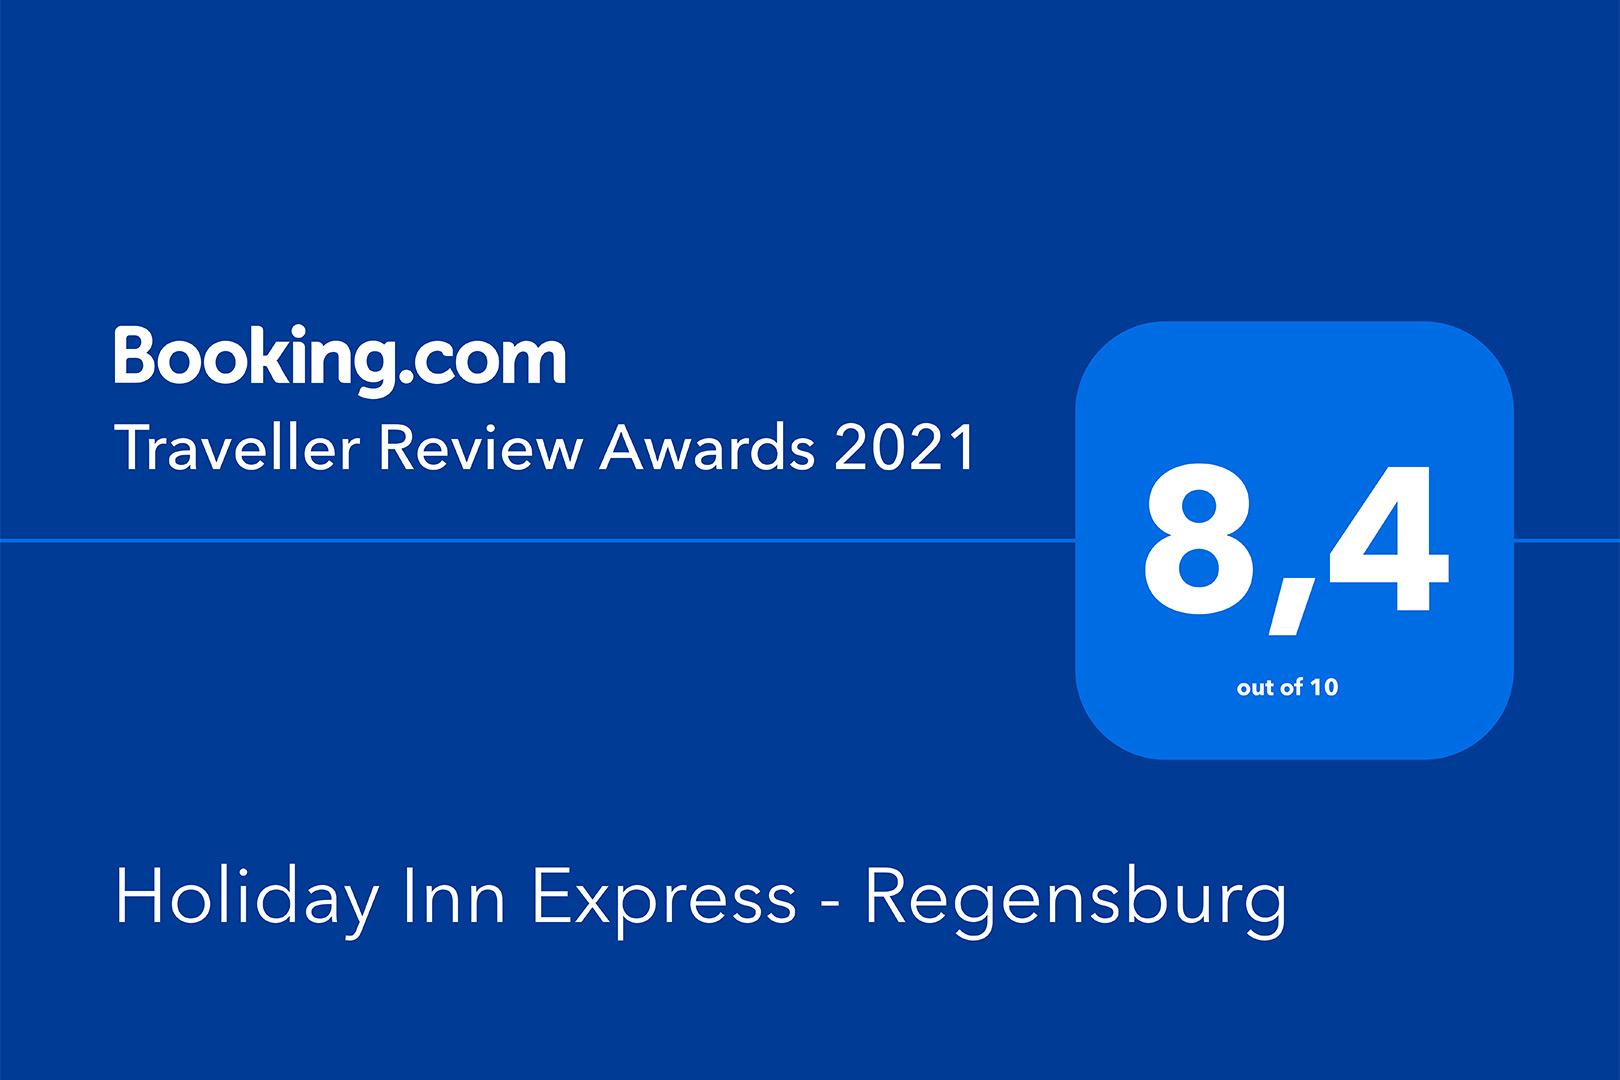 Holiday Inn Express Regensburg - Traveller Review Award 2021